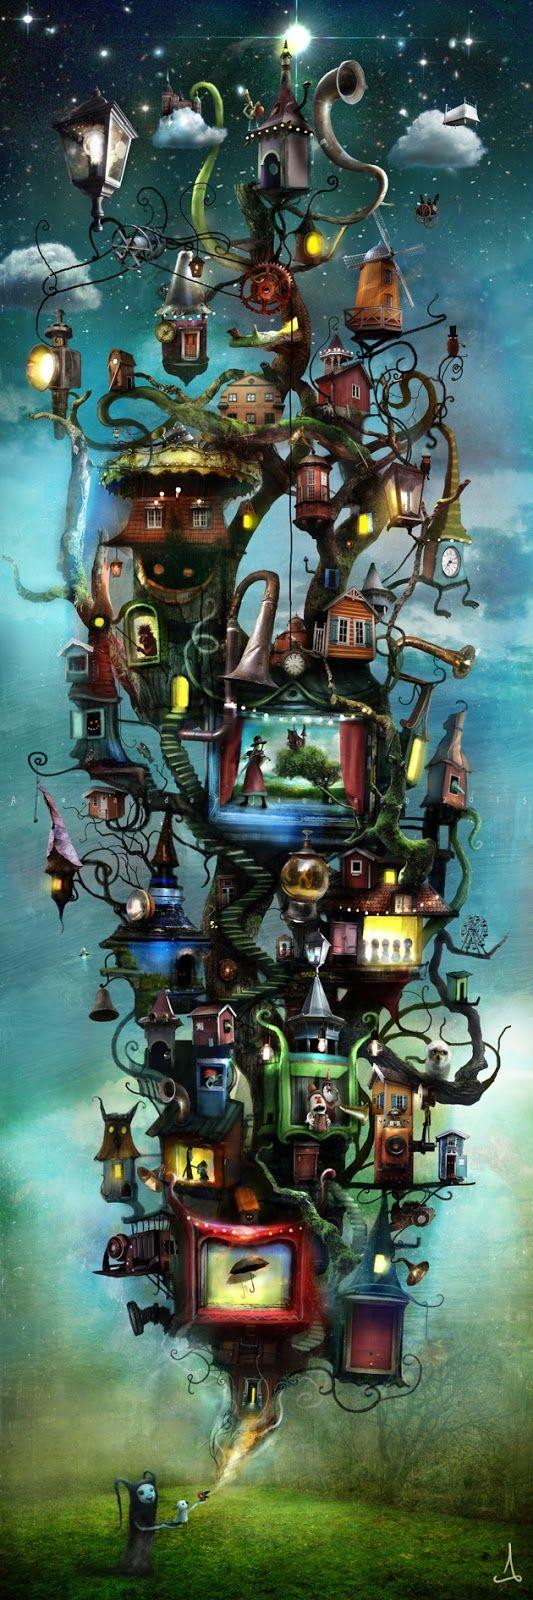 alexander jansson: Illustrations